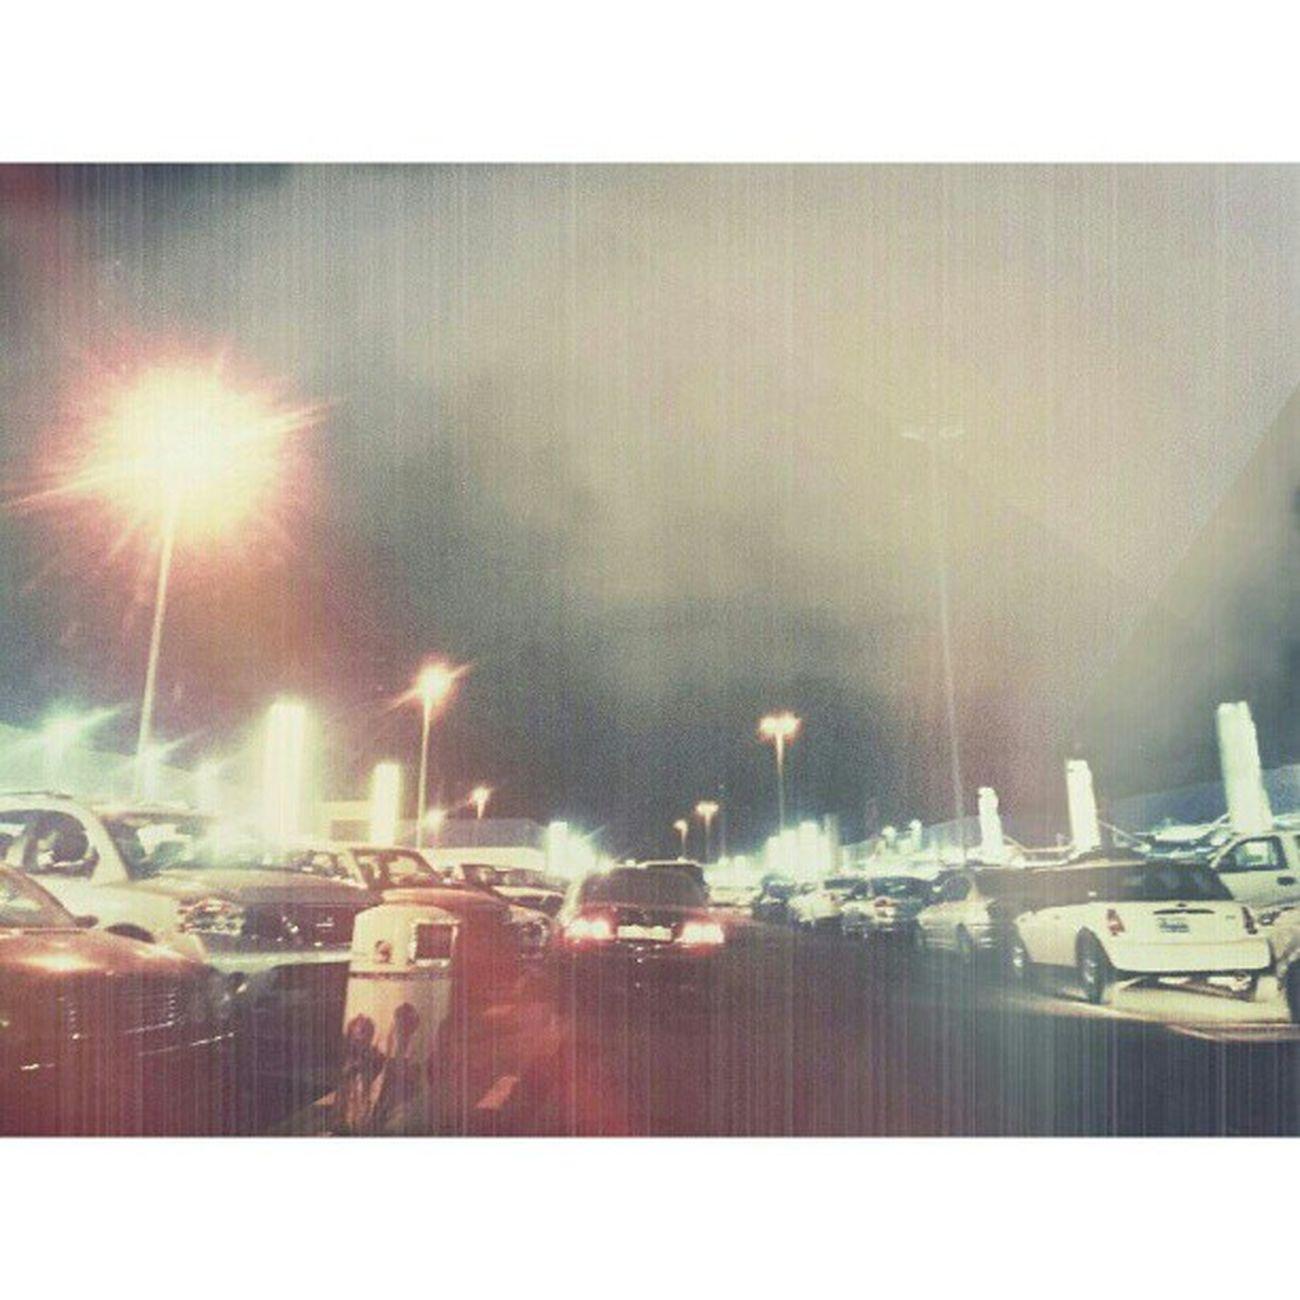 The car yard #dubai #droidedit #photosquarer #snapseed #lilphoto #ndpattern #mextures #impashape #lumiform Dubai Snapseed DroidEdit Mextures Lumiform Ndpattern Photosquarer Impashape Lilphoto